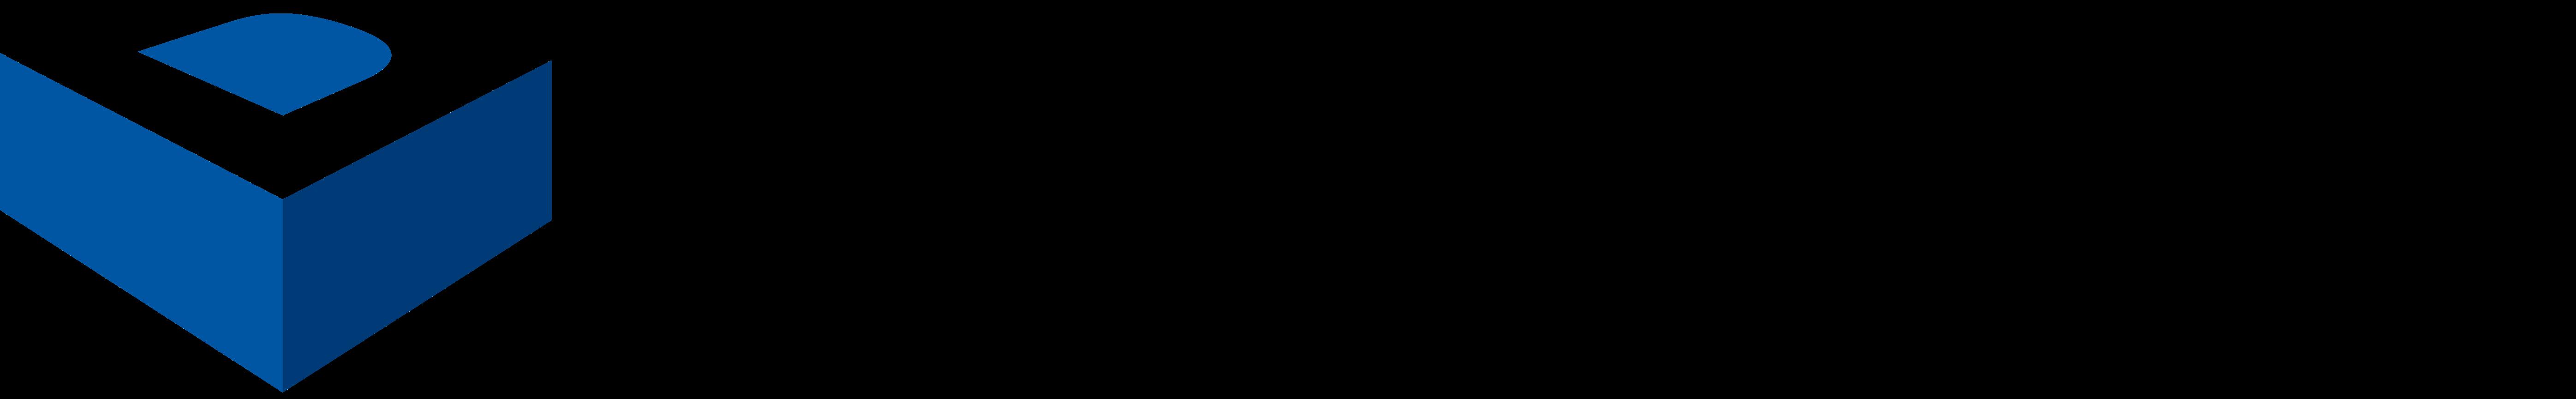 D25957-6-673433-0